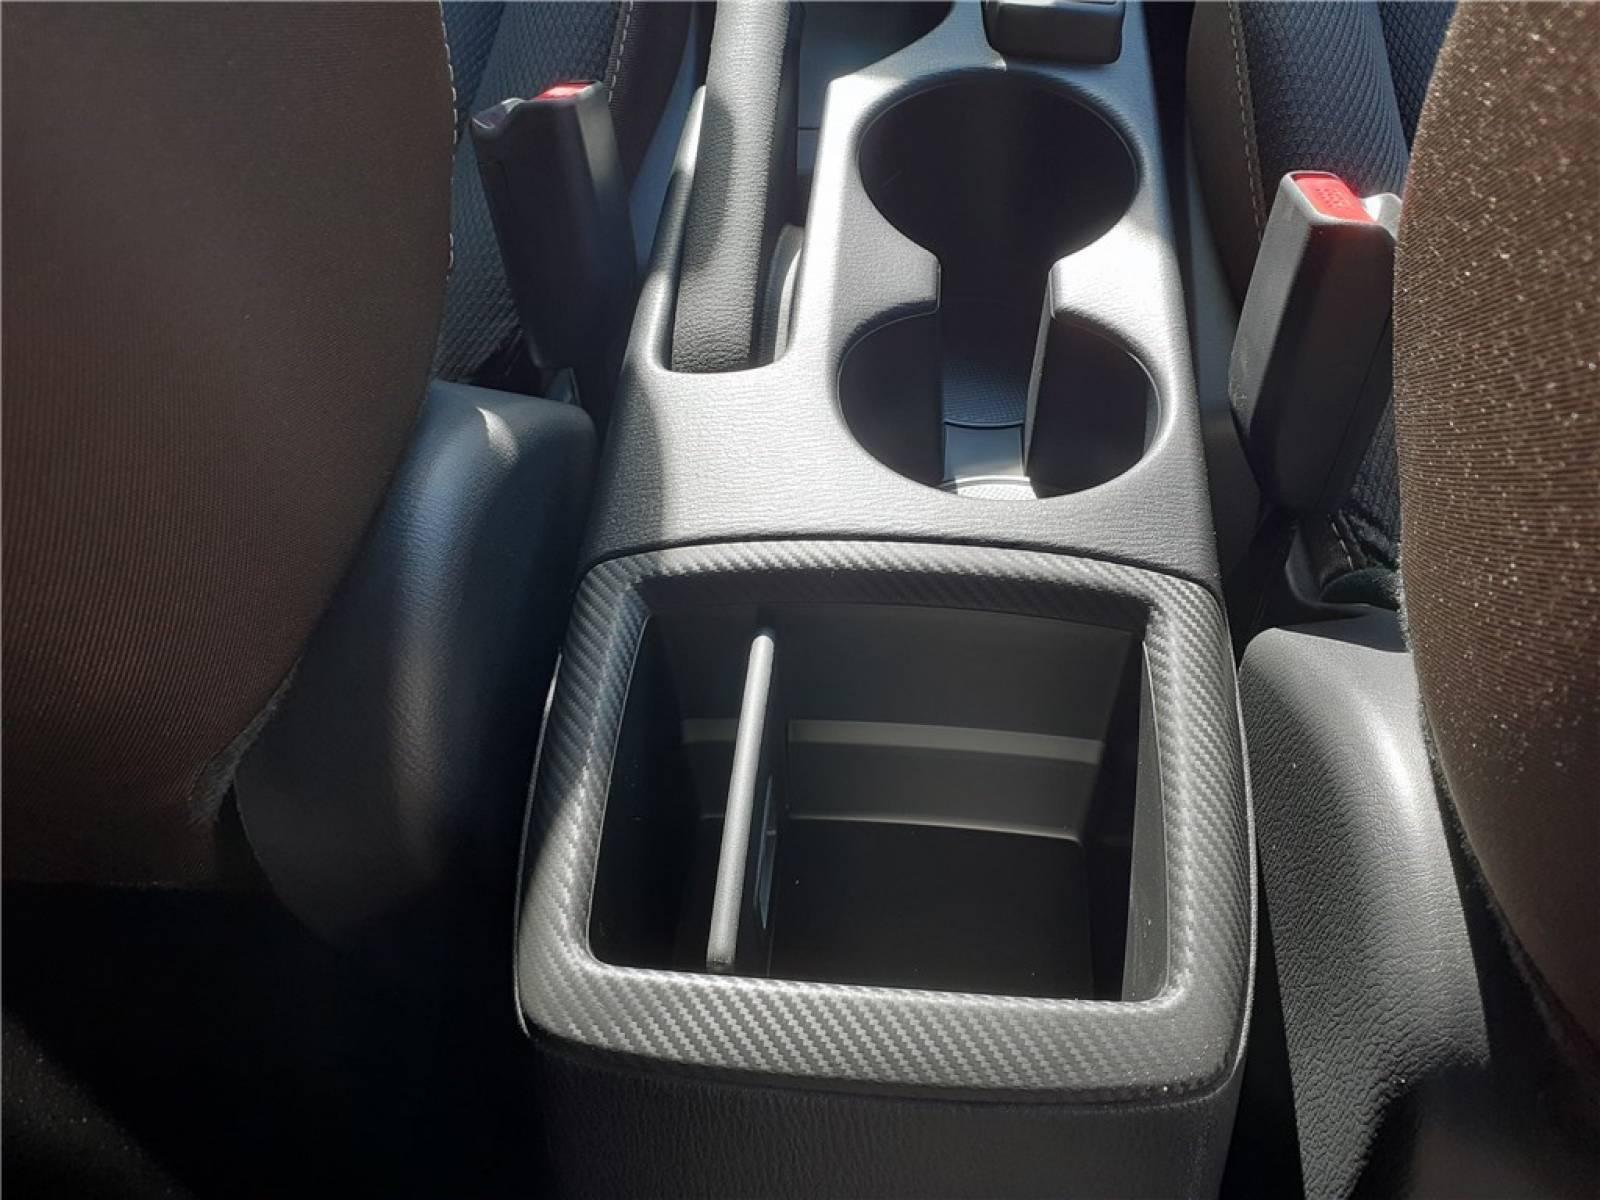 MAZDA Mazda2 1.5L SKYACTIV-G M Hybrid 90ch - véhicule d'occasion - Groupe Guillet - Chalon Automobiles - 71100 - Chalon-sur-Saône - 15